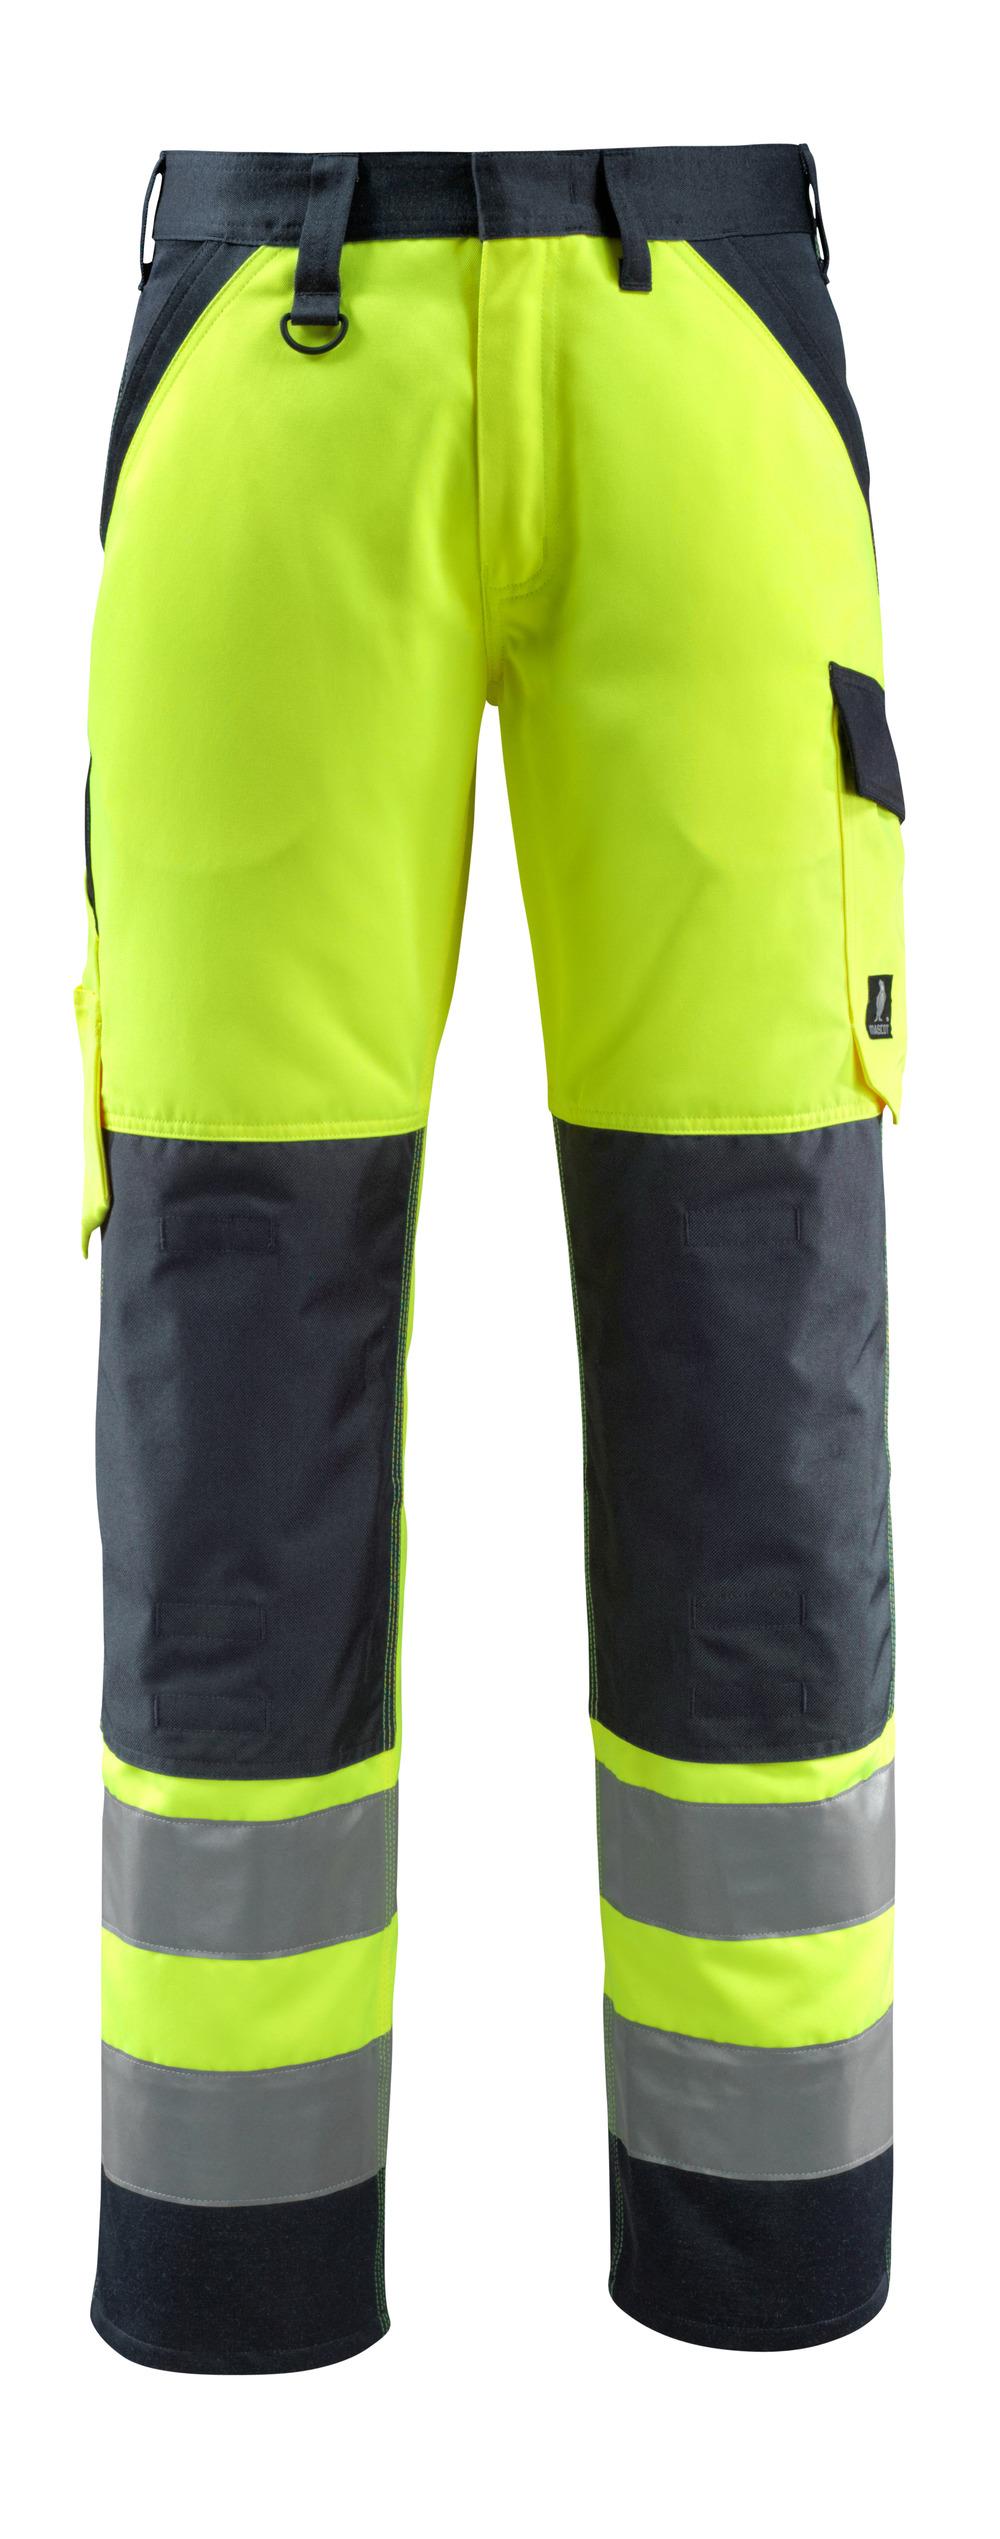 15979-948-17010 Bukser med knelommer - hi-vis gul/mørk marine